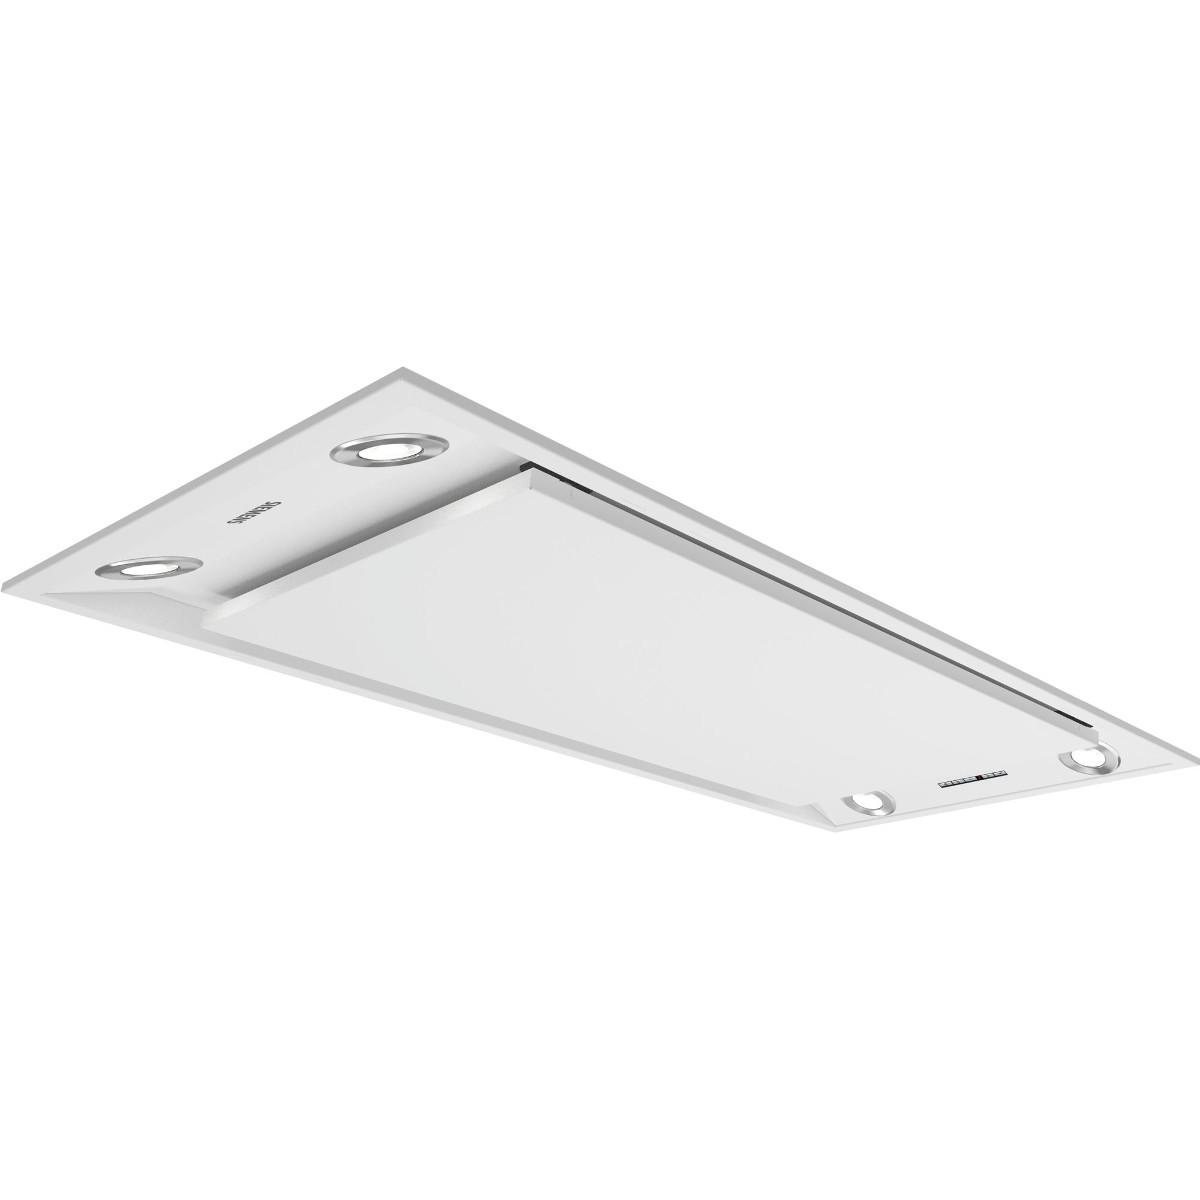 Siemens Lf959rb21b Iq700 Ceiling Hood White Discount